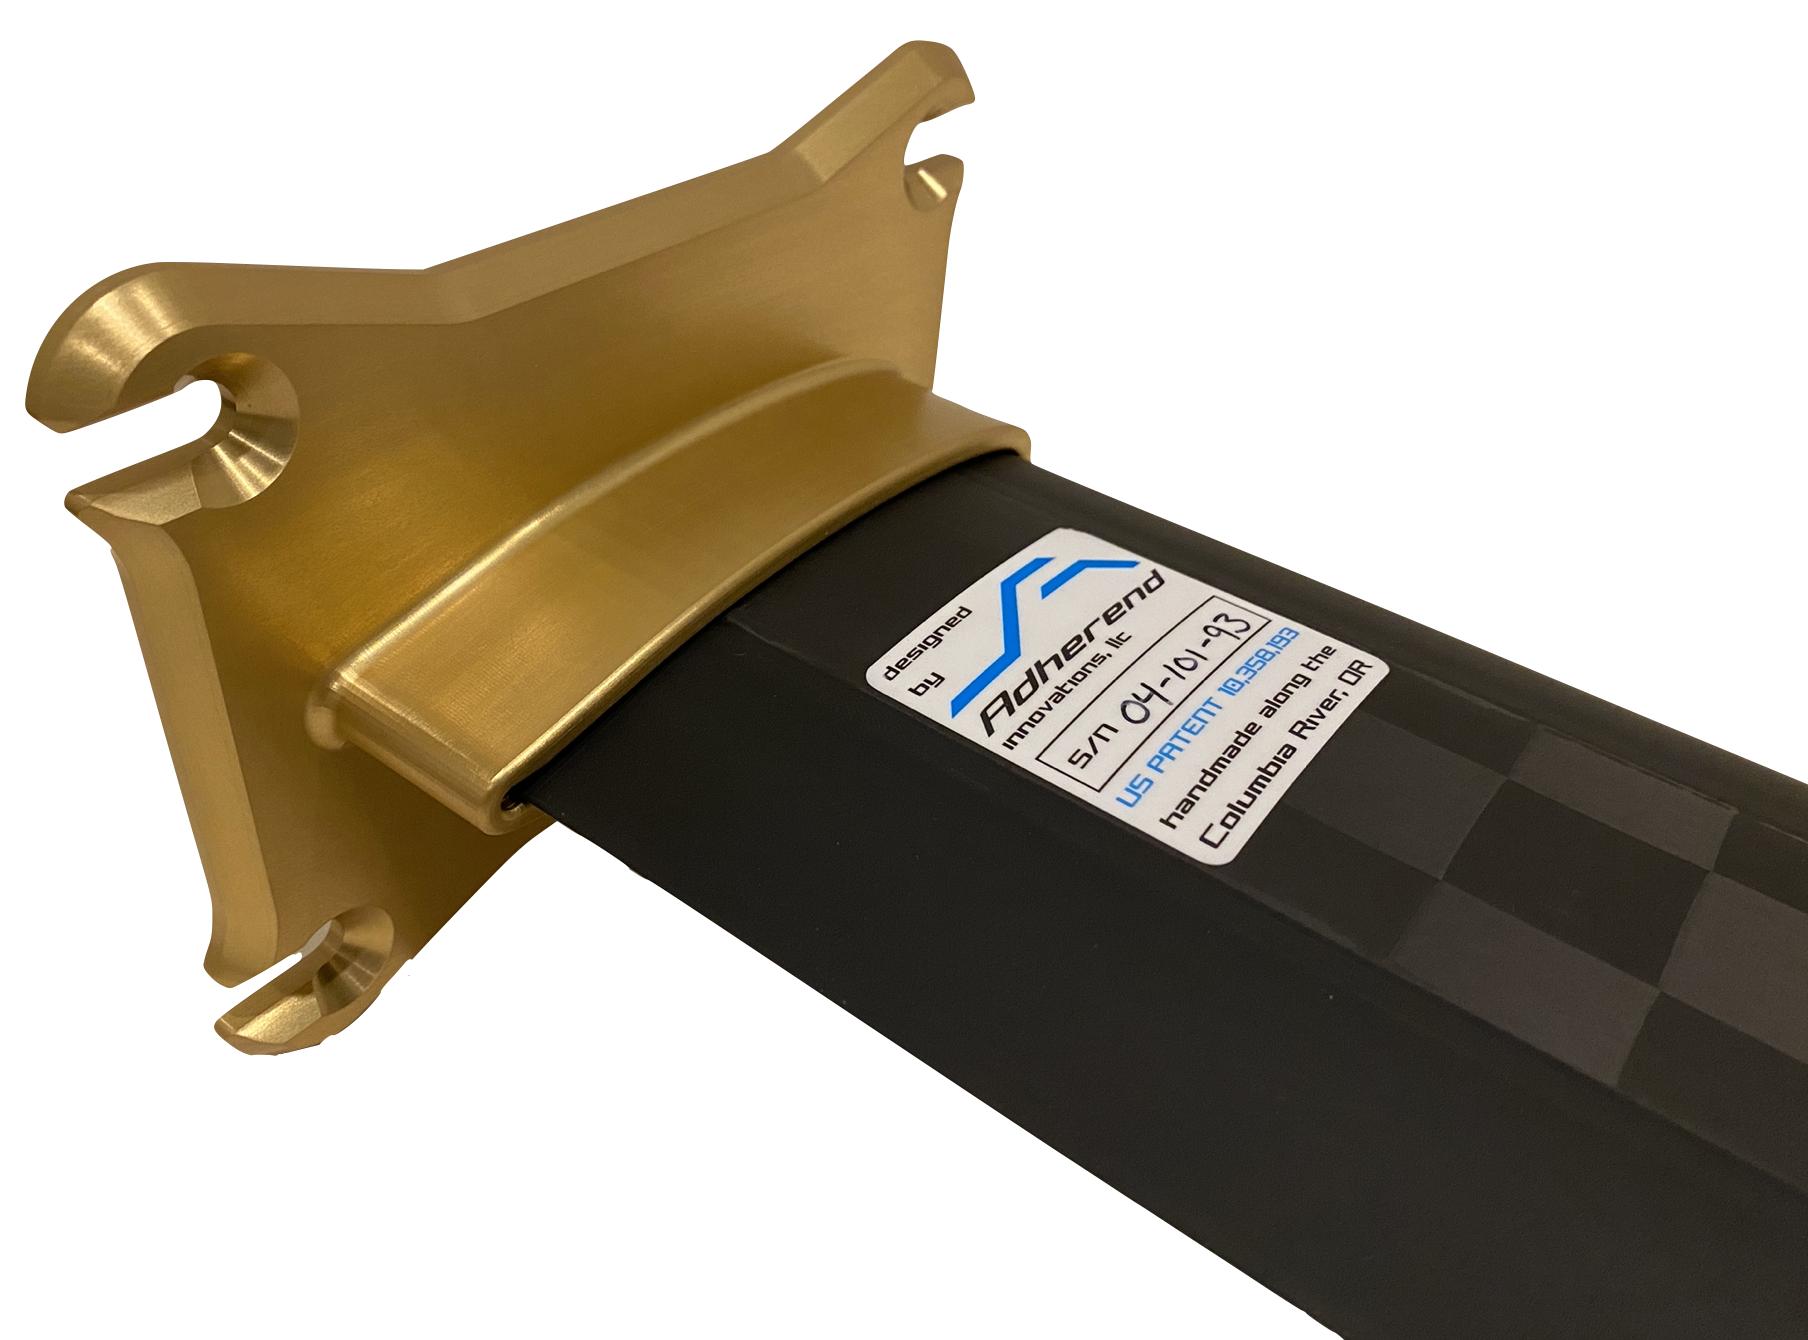 Carbon fiber hydrofoil adapters mounts